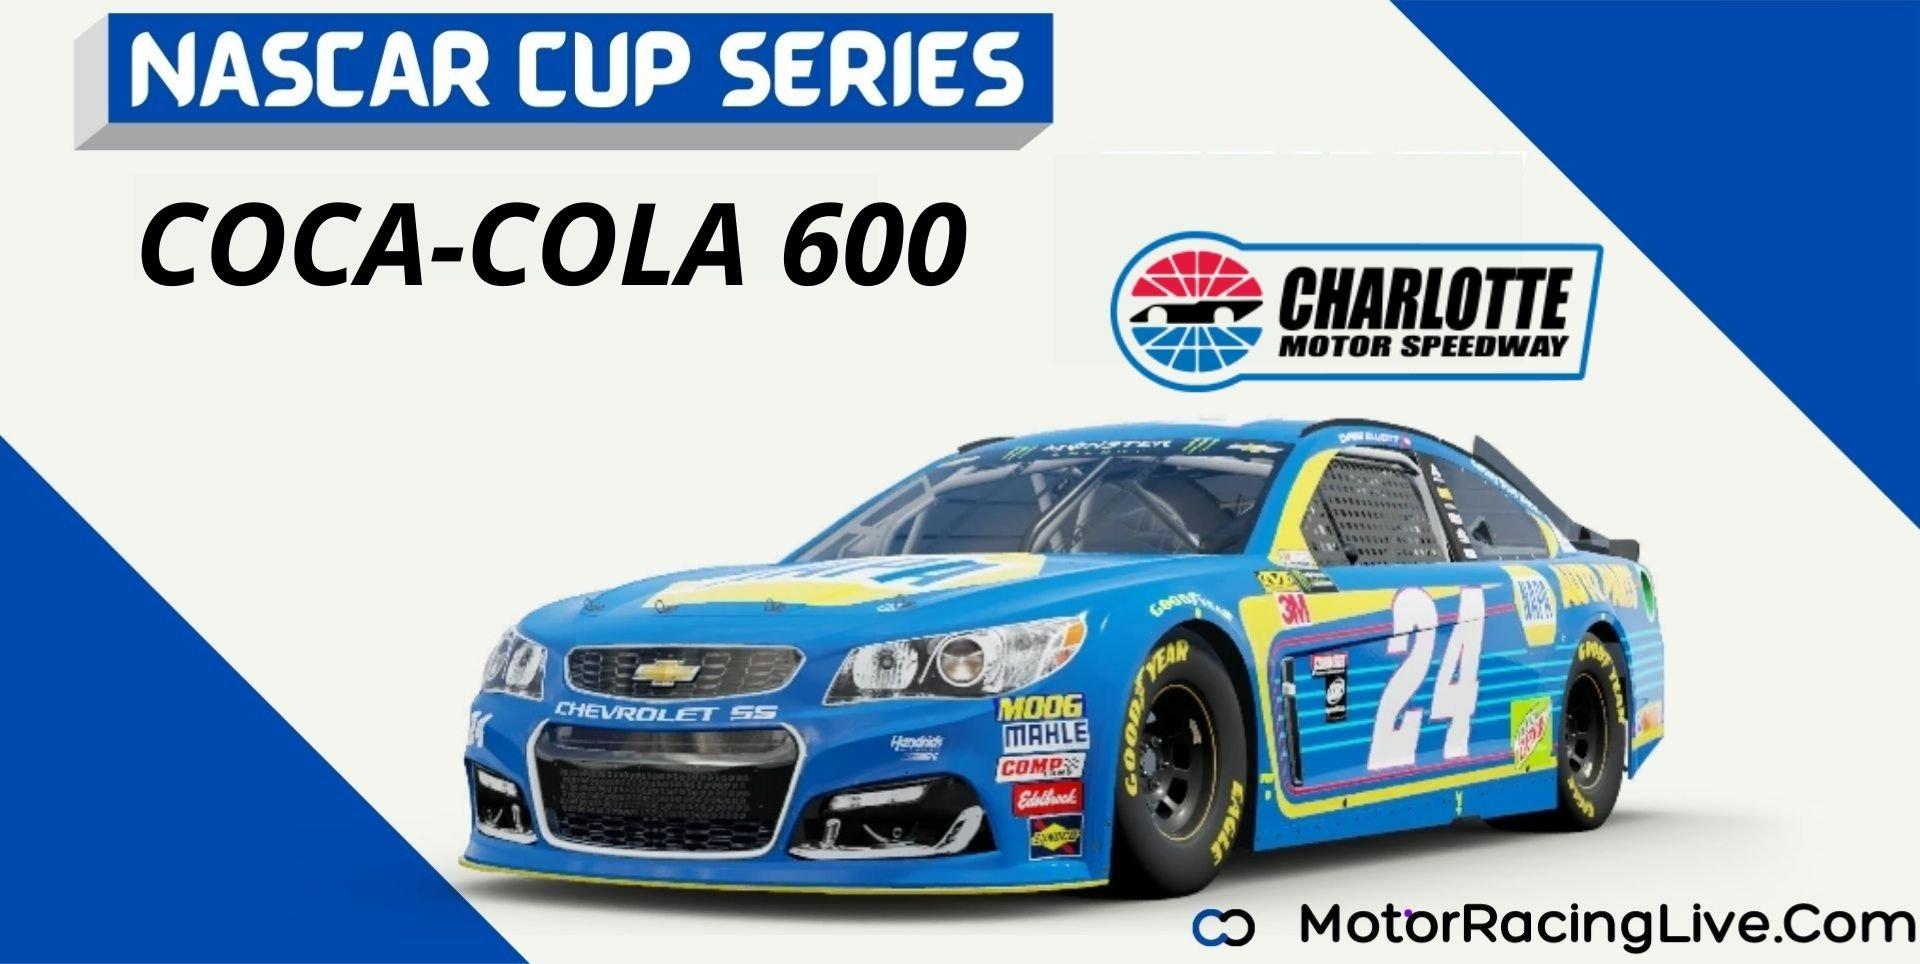 Coca-Cola 600 Nascar Cup Series 2021 Live Stream